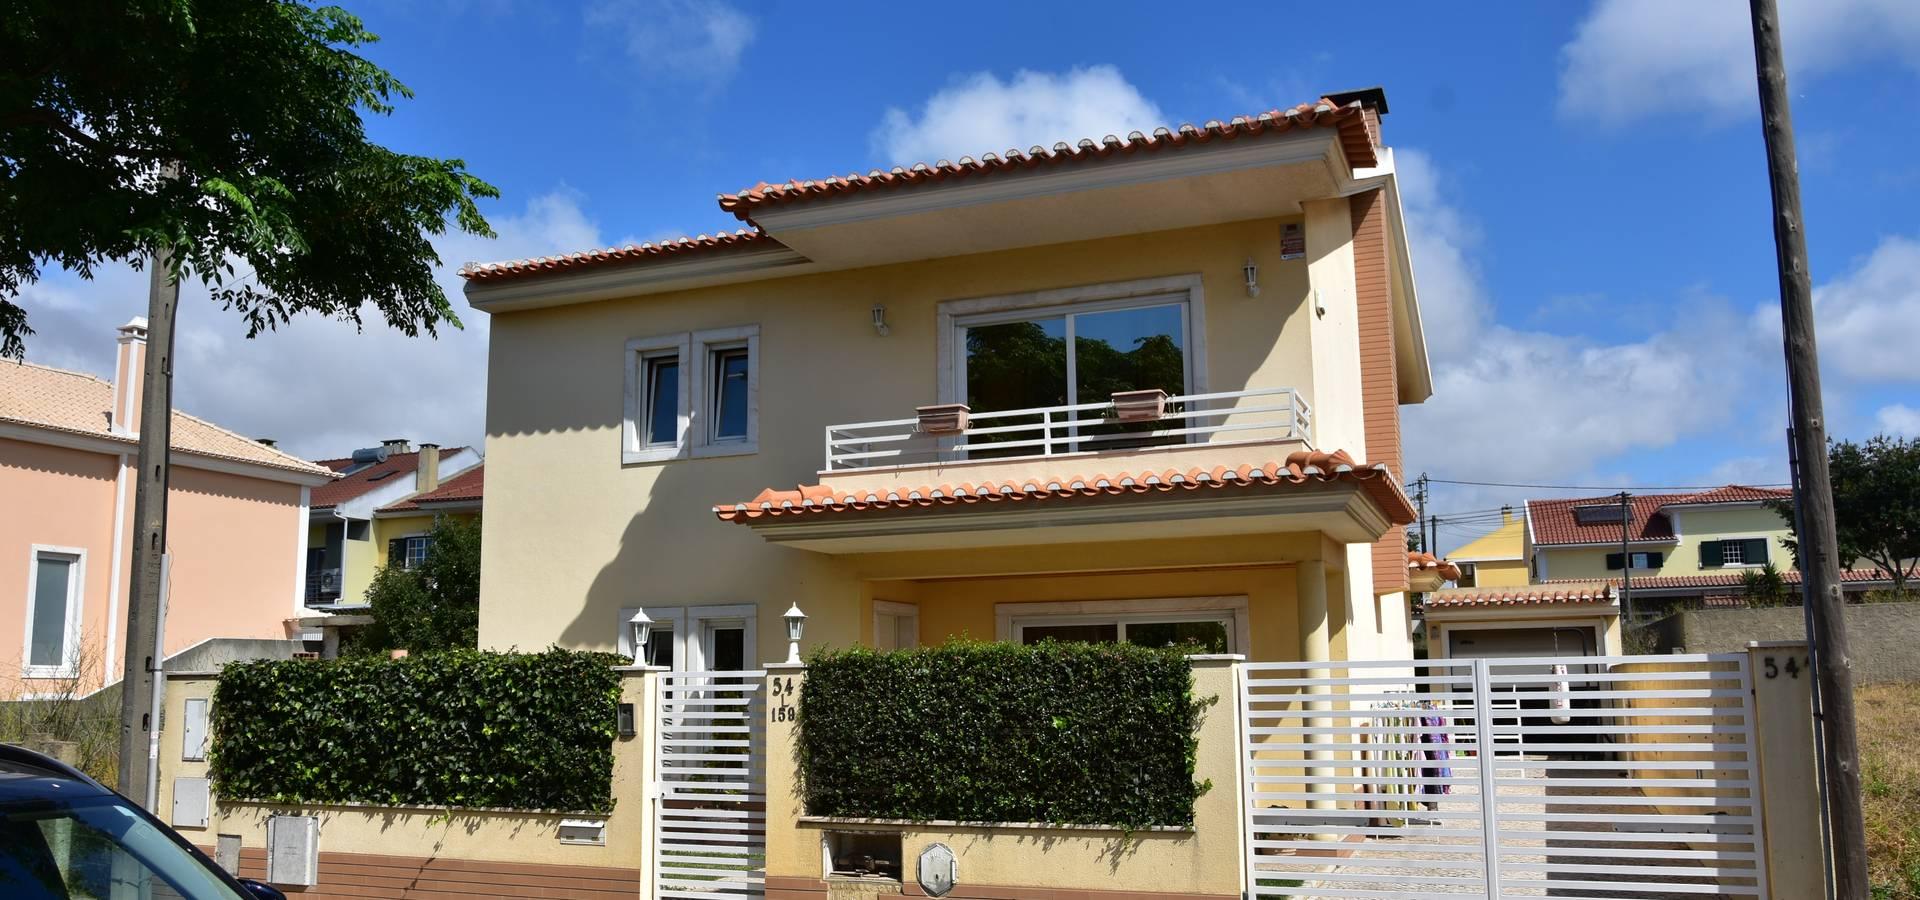 VITOR PEREIRA – EasyGest Premium Properties